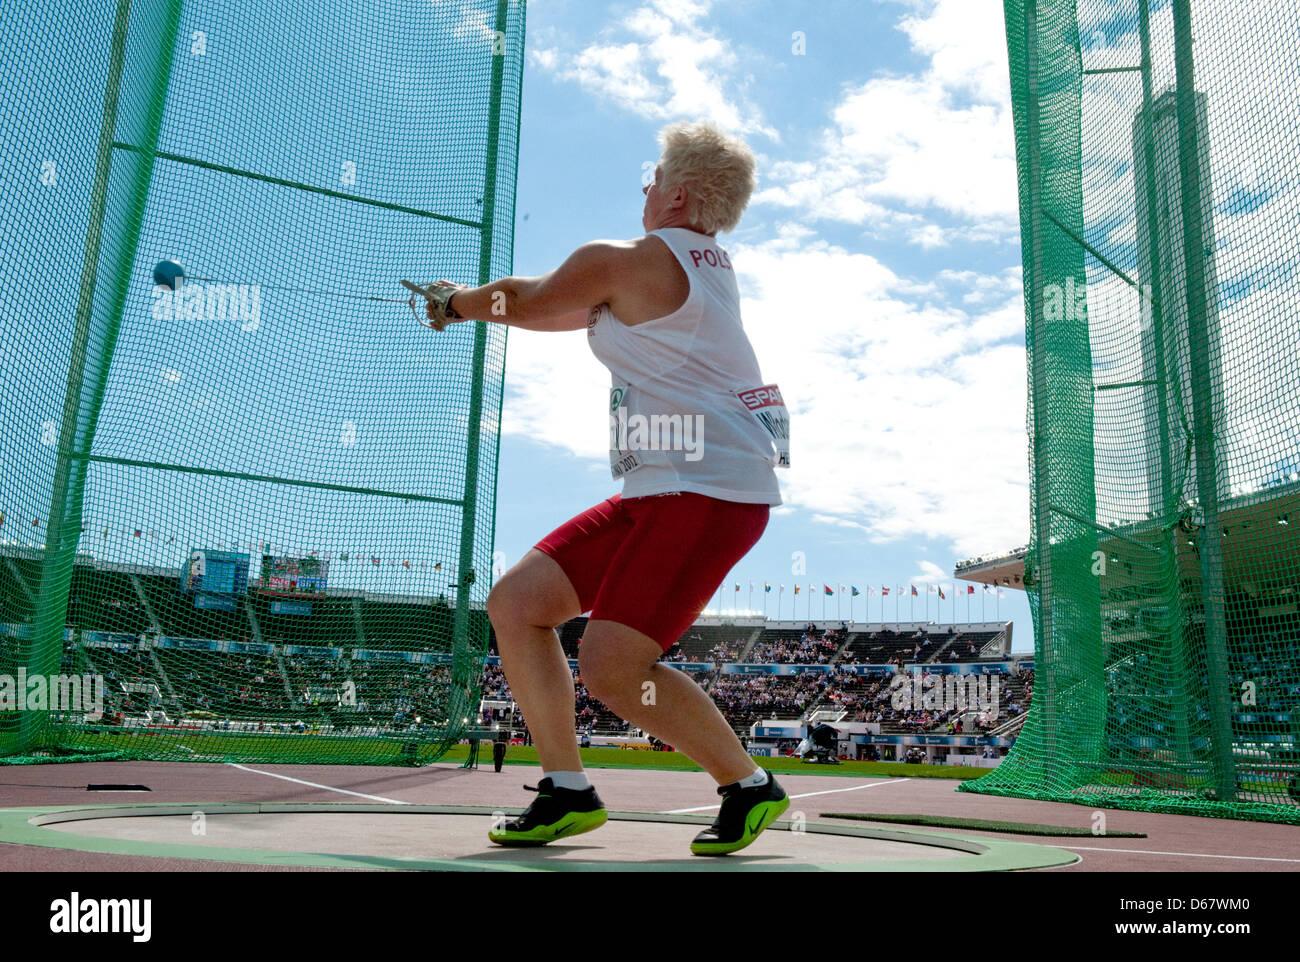 Aksana Miankowa Photos Pictures of Aksana Miankowa Getty 2008 olympic hammer throw photo gallery